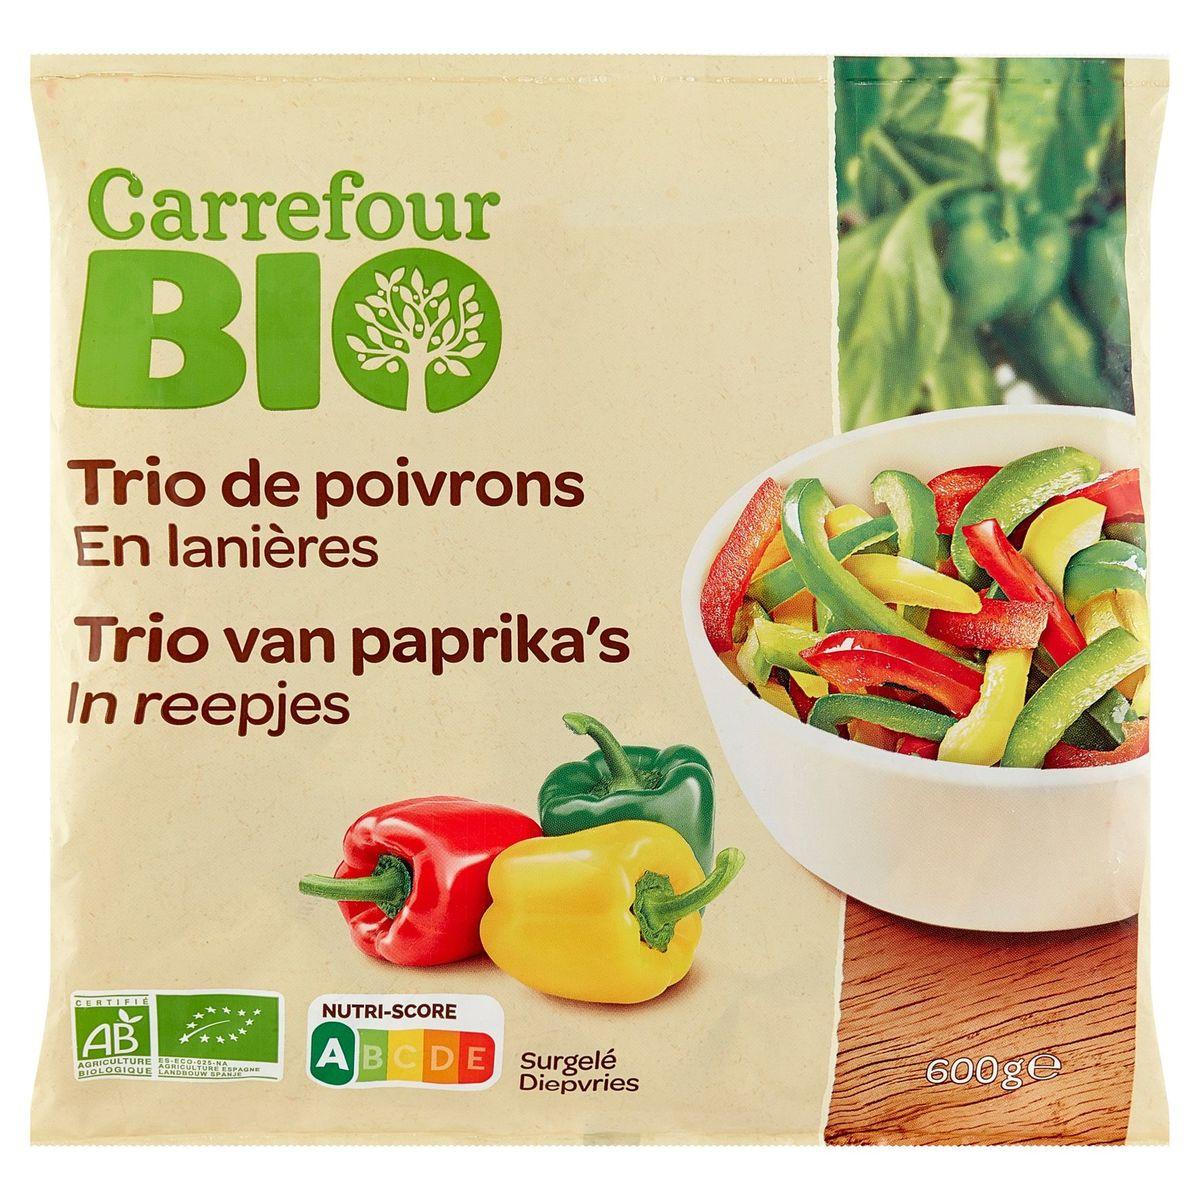 Carrefour Bio Trio van Paprika's in Reepjes 600 g